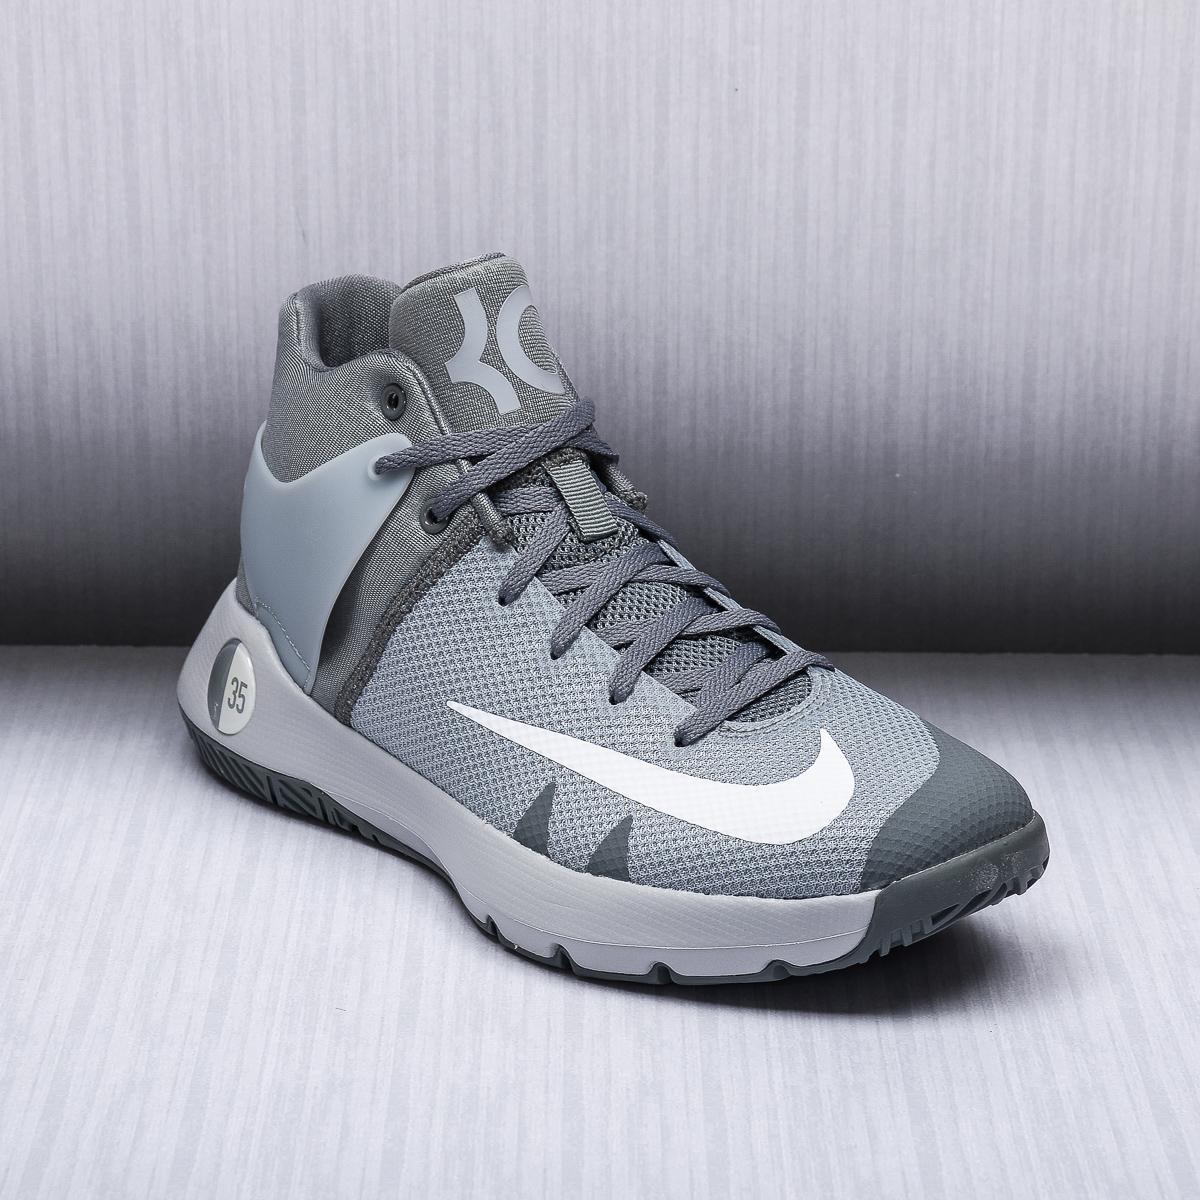 fa14257e7b87 KD TREY IV 844571 010 SIZE - cheap nike shoes